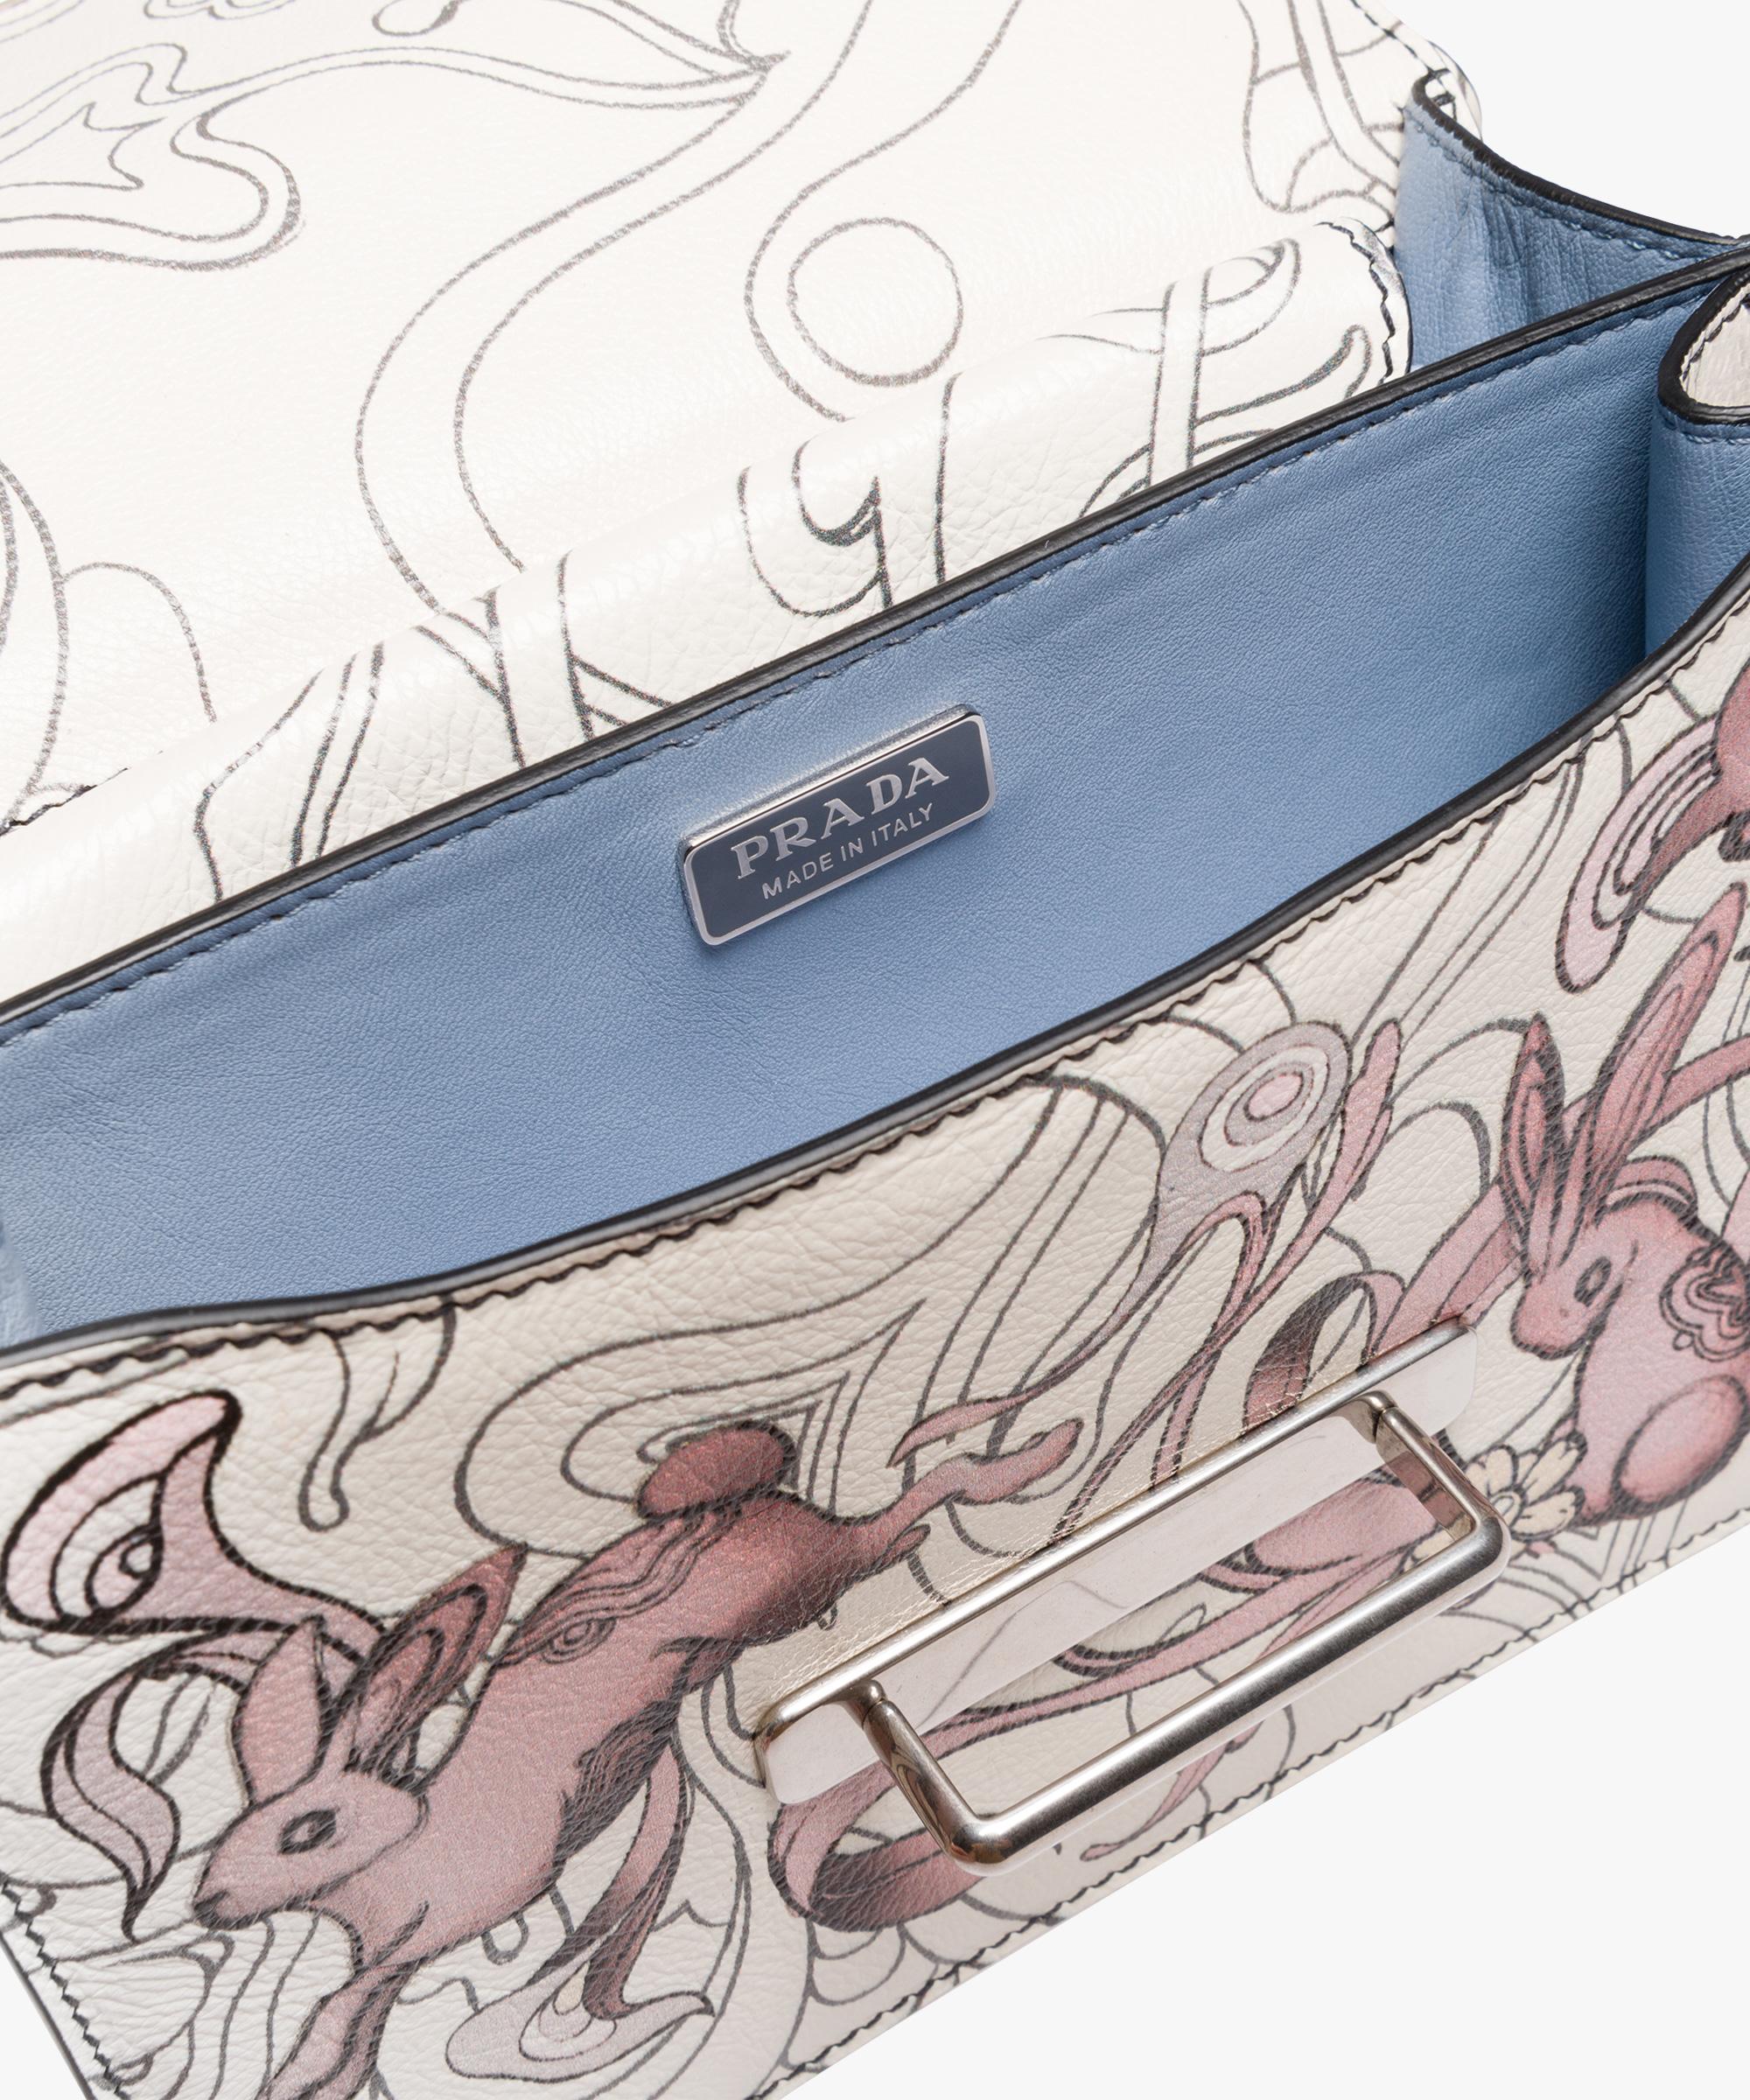 d9cae32d9fb Prada Cahier printed leather bag Prada OPALINE ...